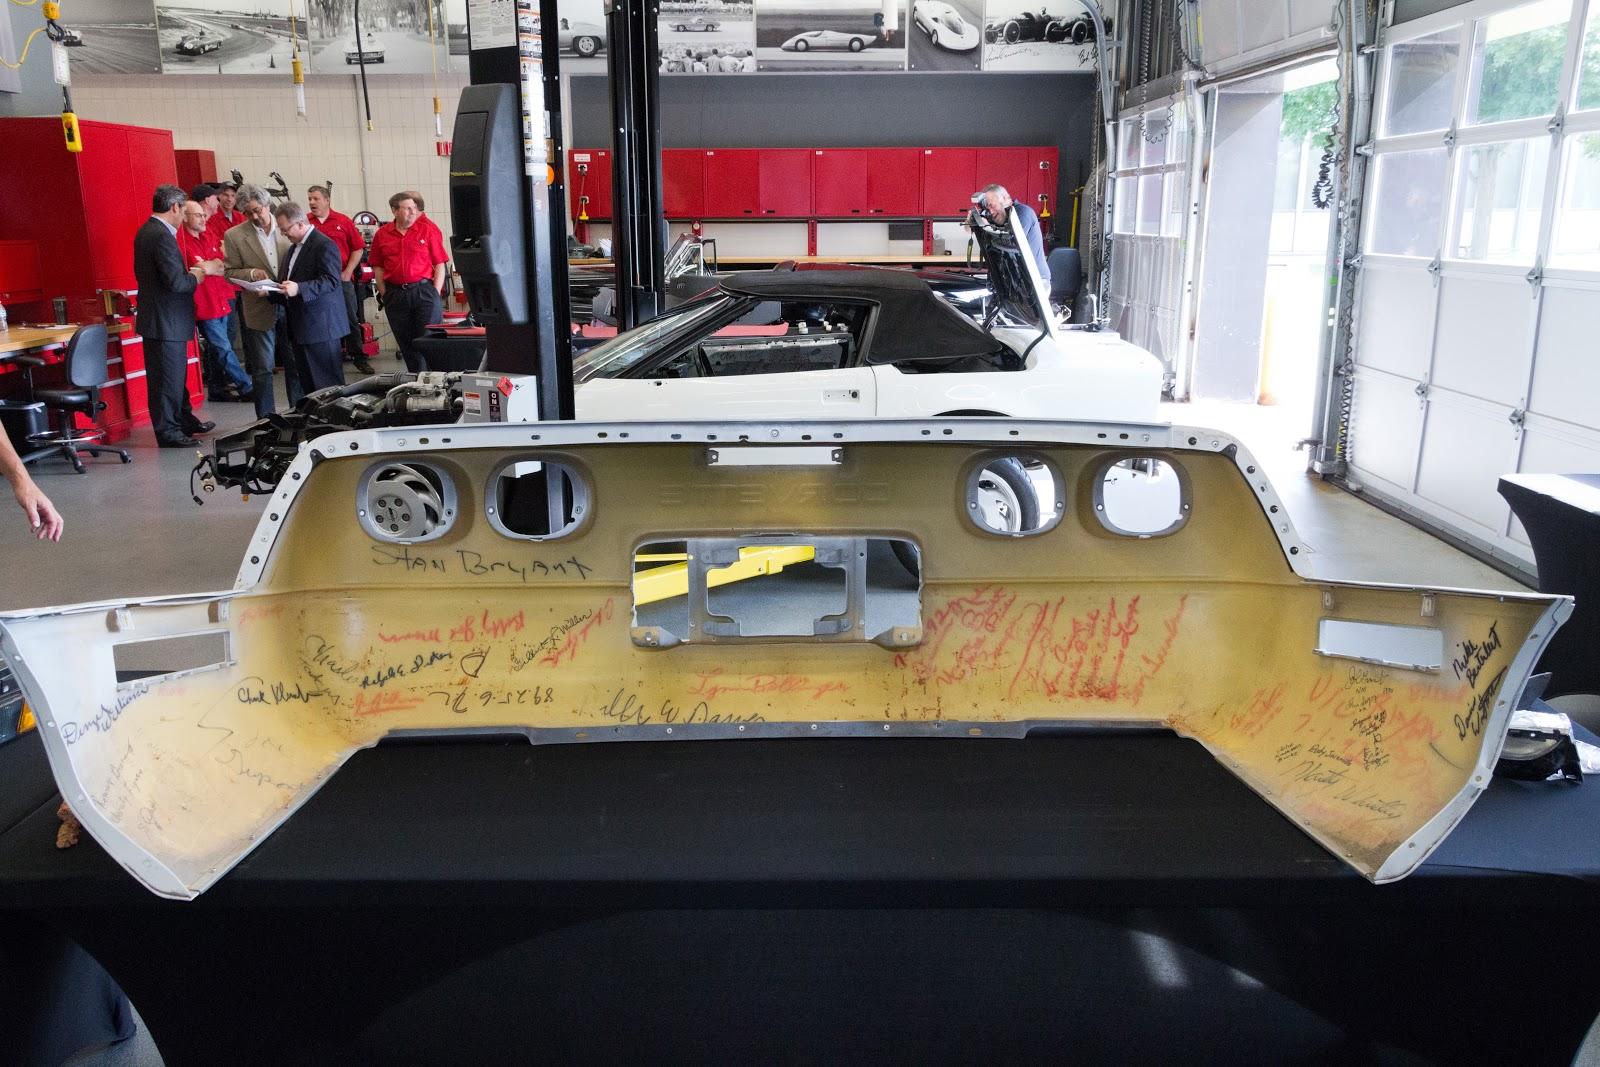 National Corvette Museum Sinkhole Swallowed 1 Millionth